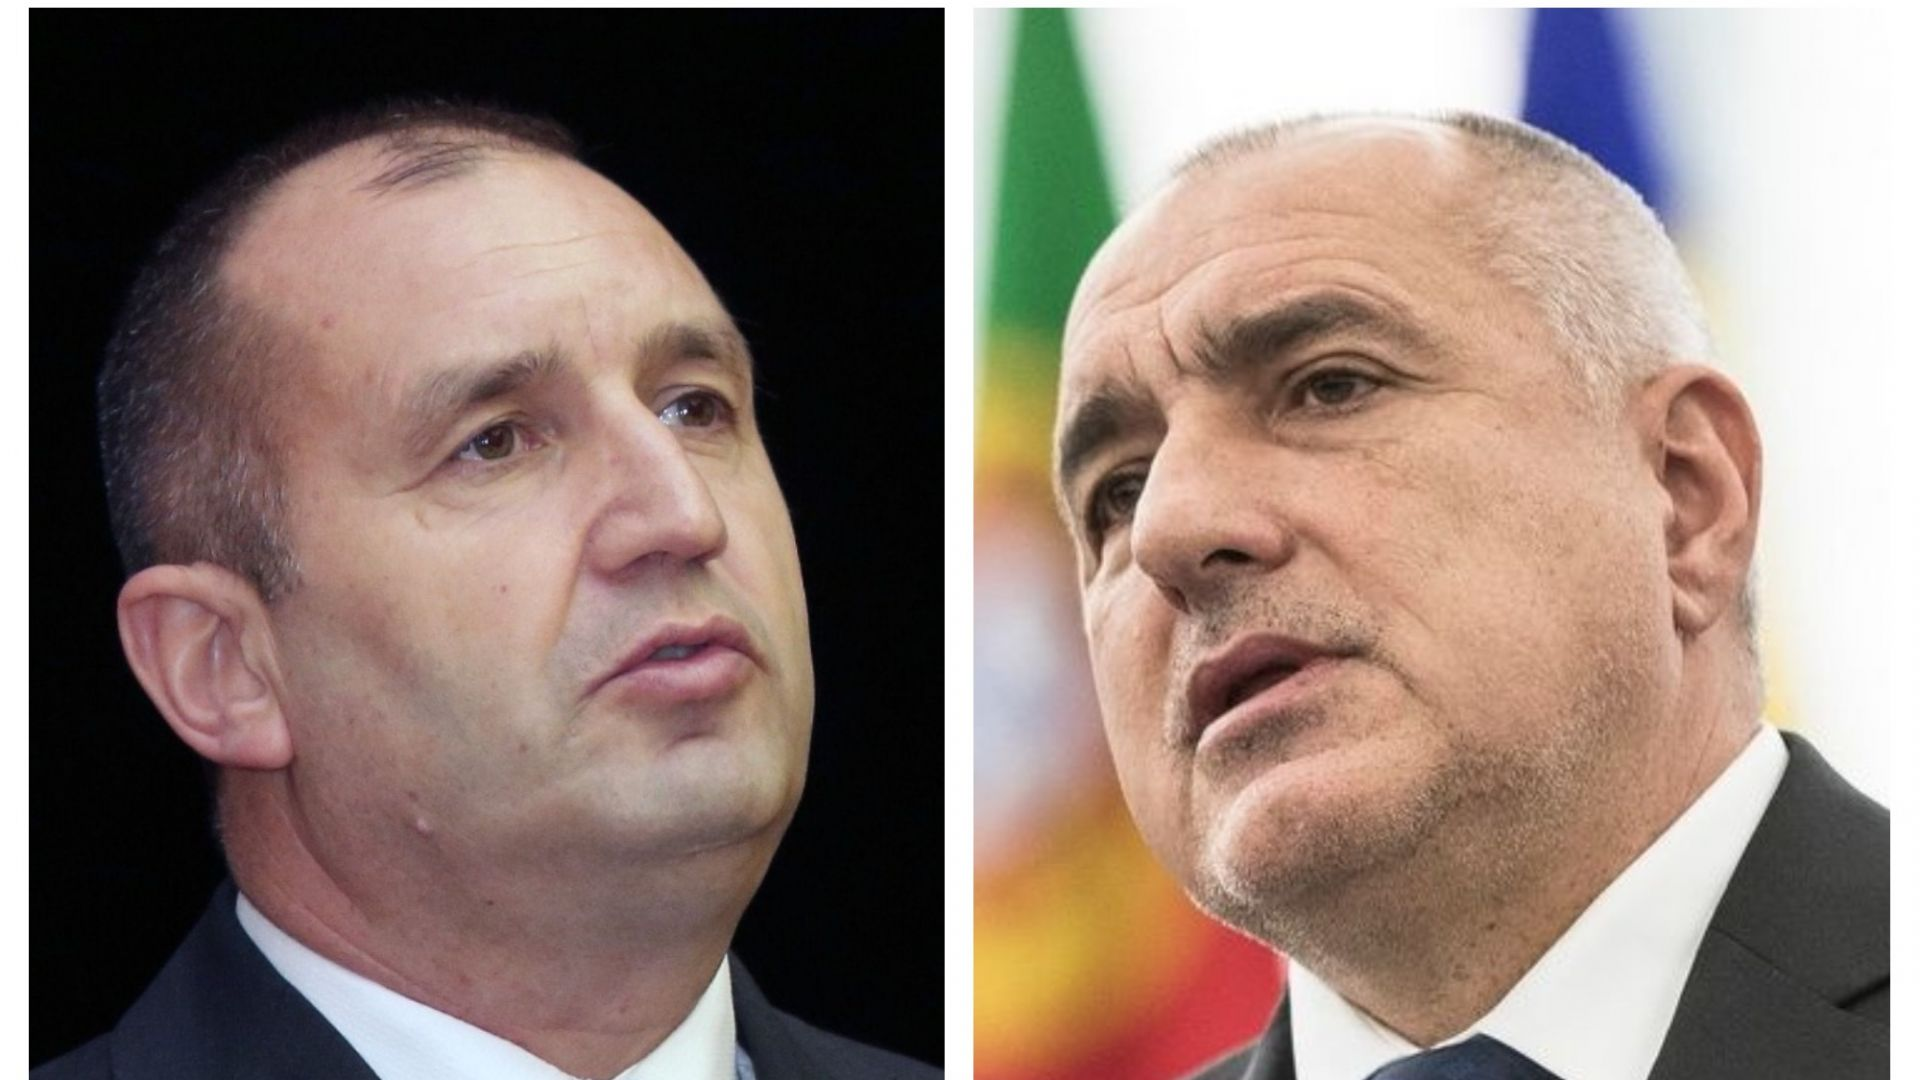 Борисов: Министрите да идат при Радев заради поръчките